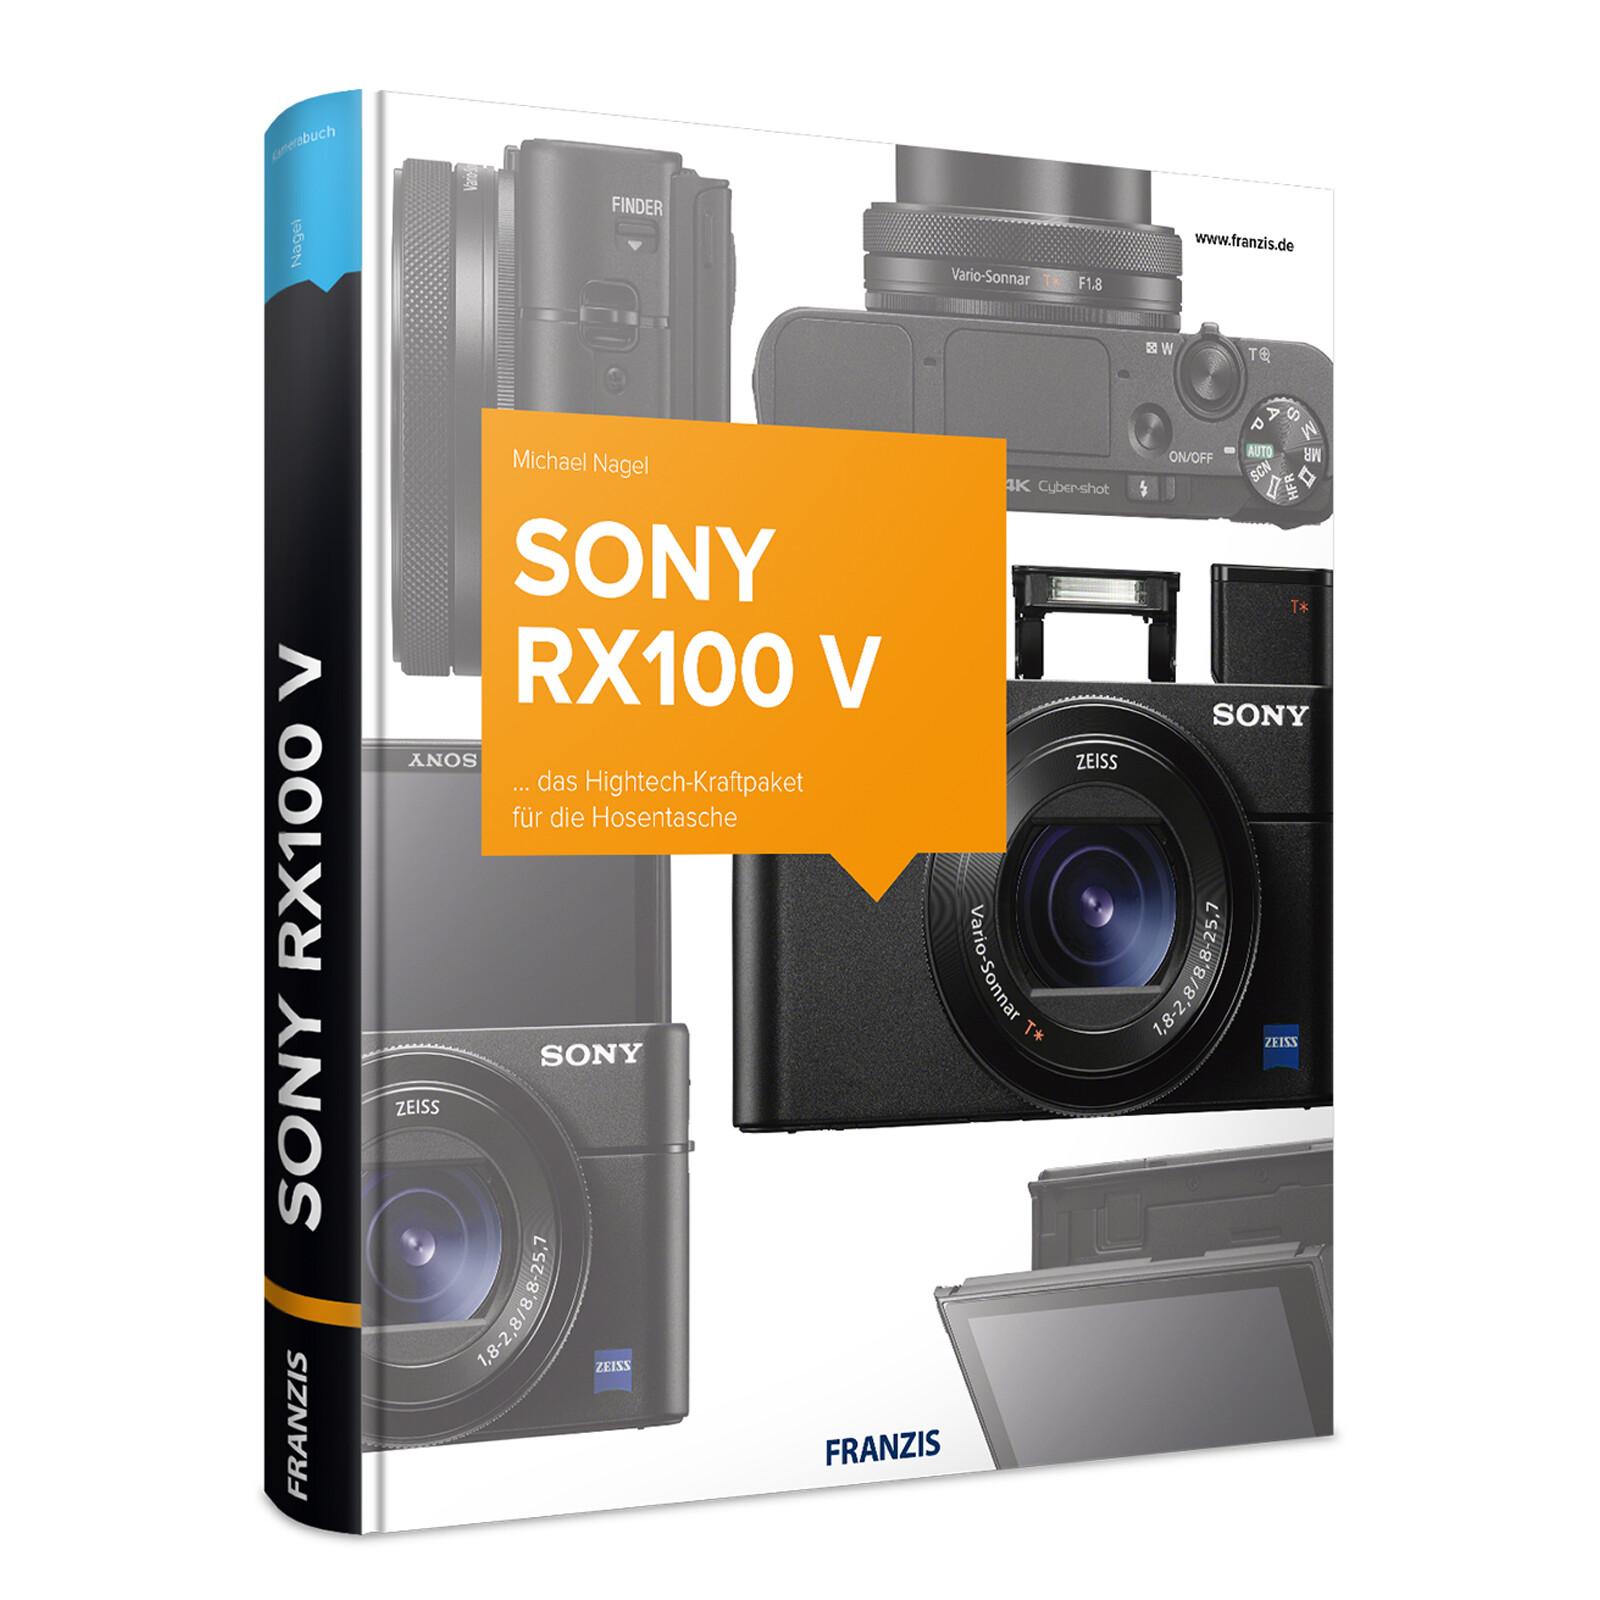 Sony RX100 V Handbuch